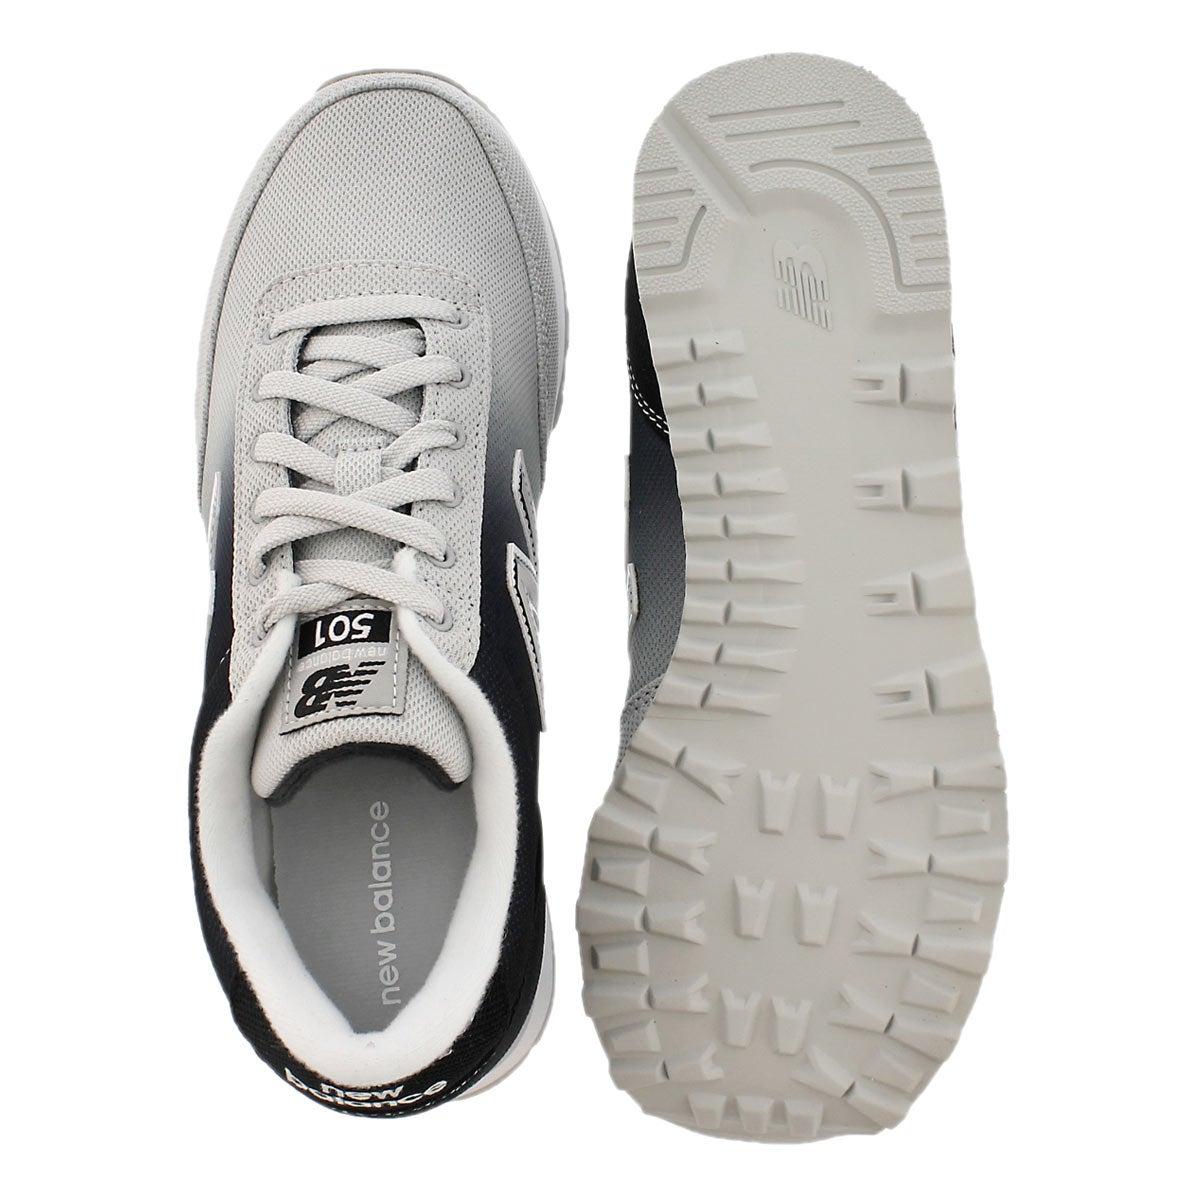 Lds 501 black/white ombre lace up